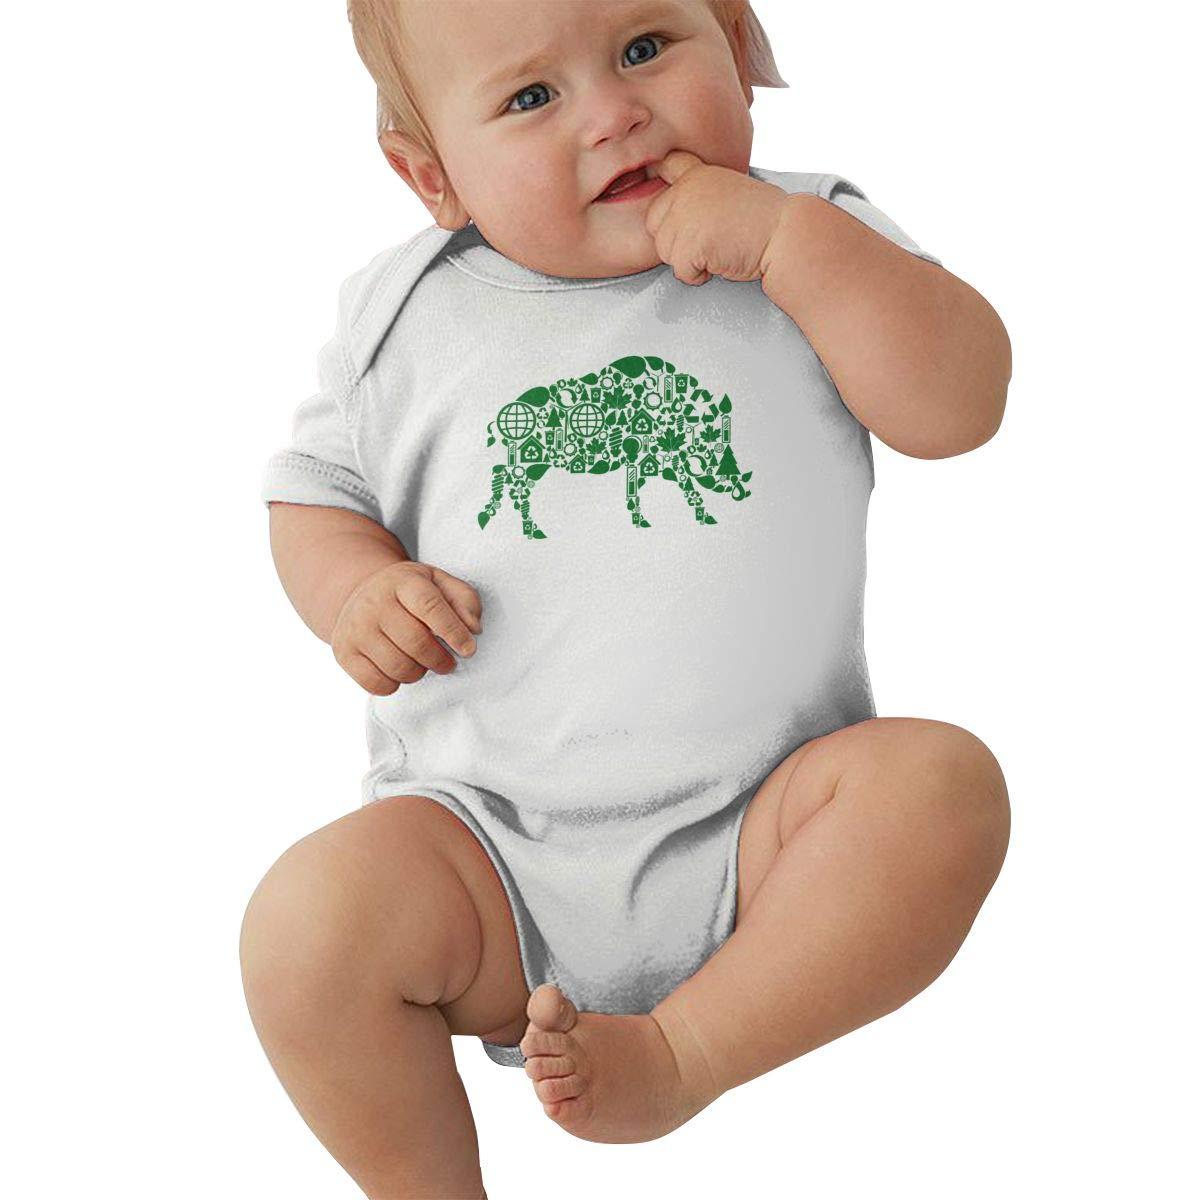 Newborn Baby Girls Bodysuit Short-Sleeve Onesie Cattle Green Silhouette Print Rompers Spring Pajamas